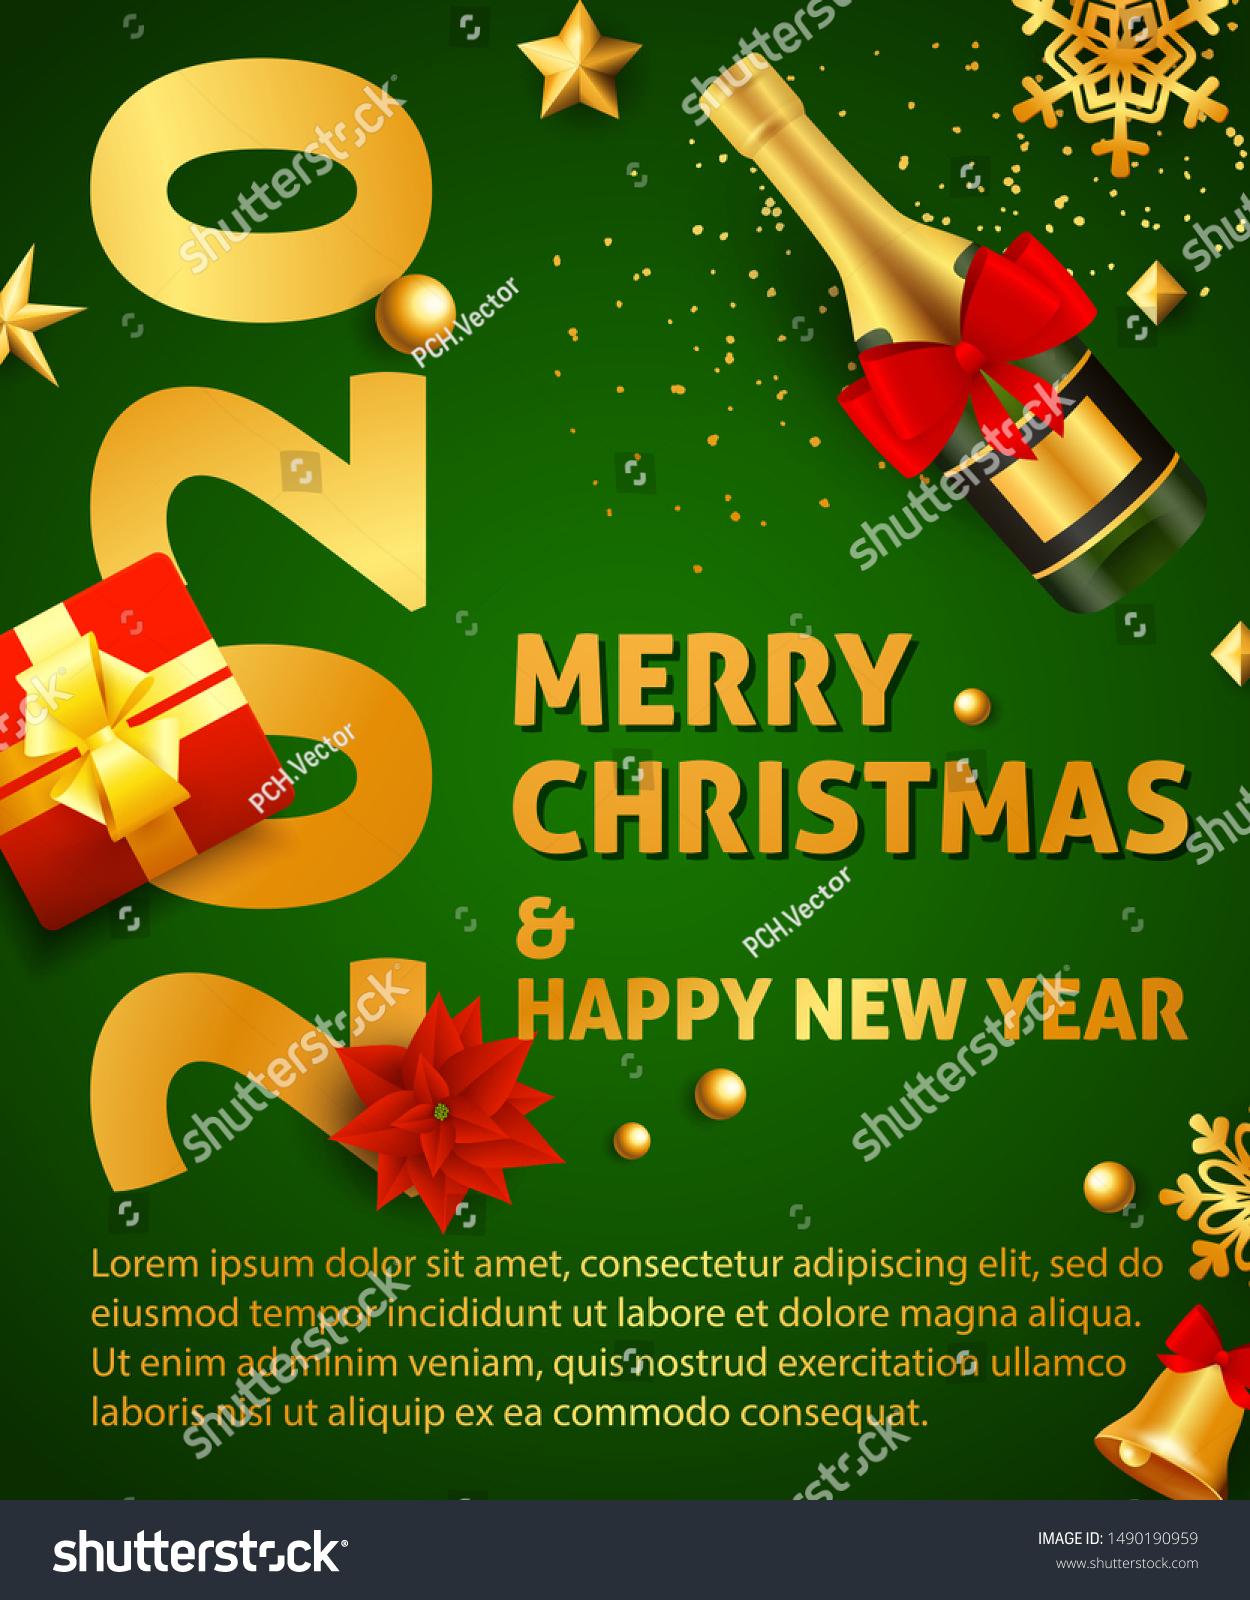 merry christmas two thousand twenty lettering stock vector royalty free 1490190959 https www shutterstock com image vector merry christmas two thousand twenty lettering 1490190959